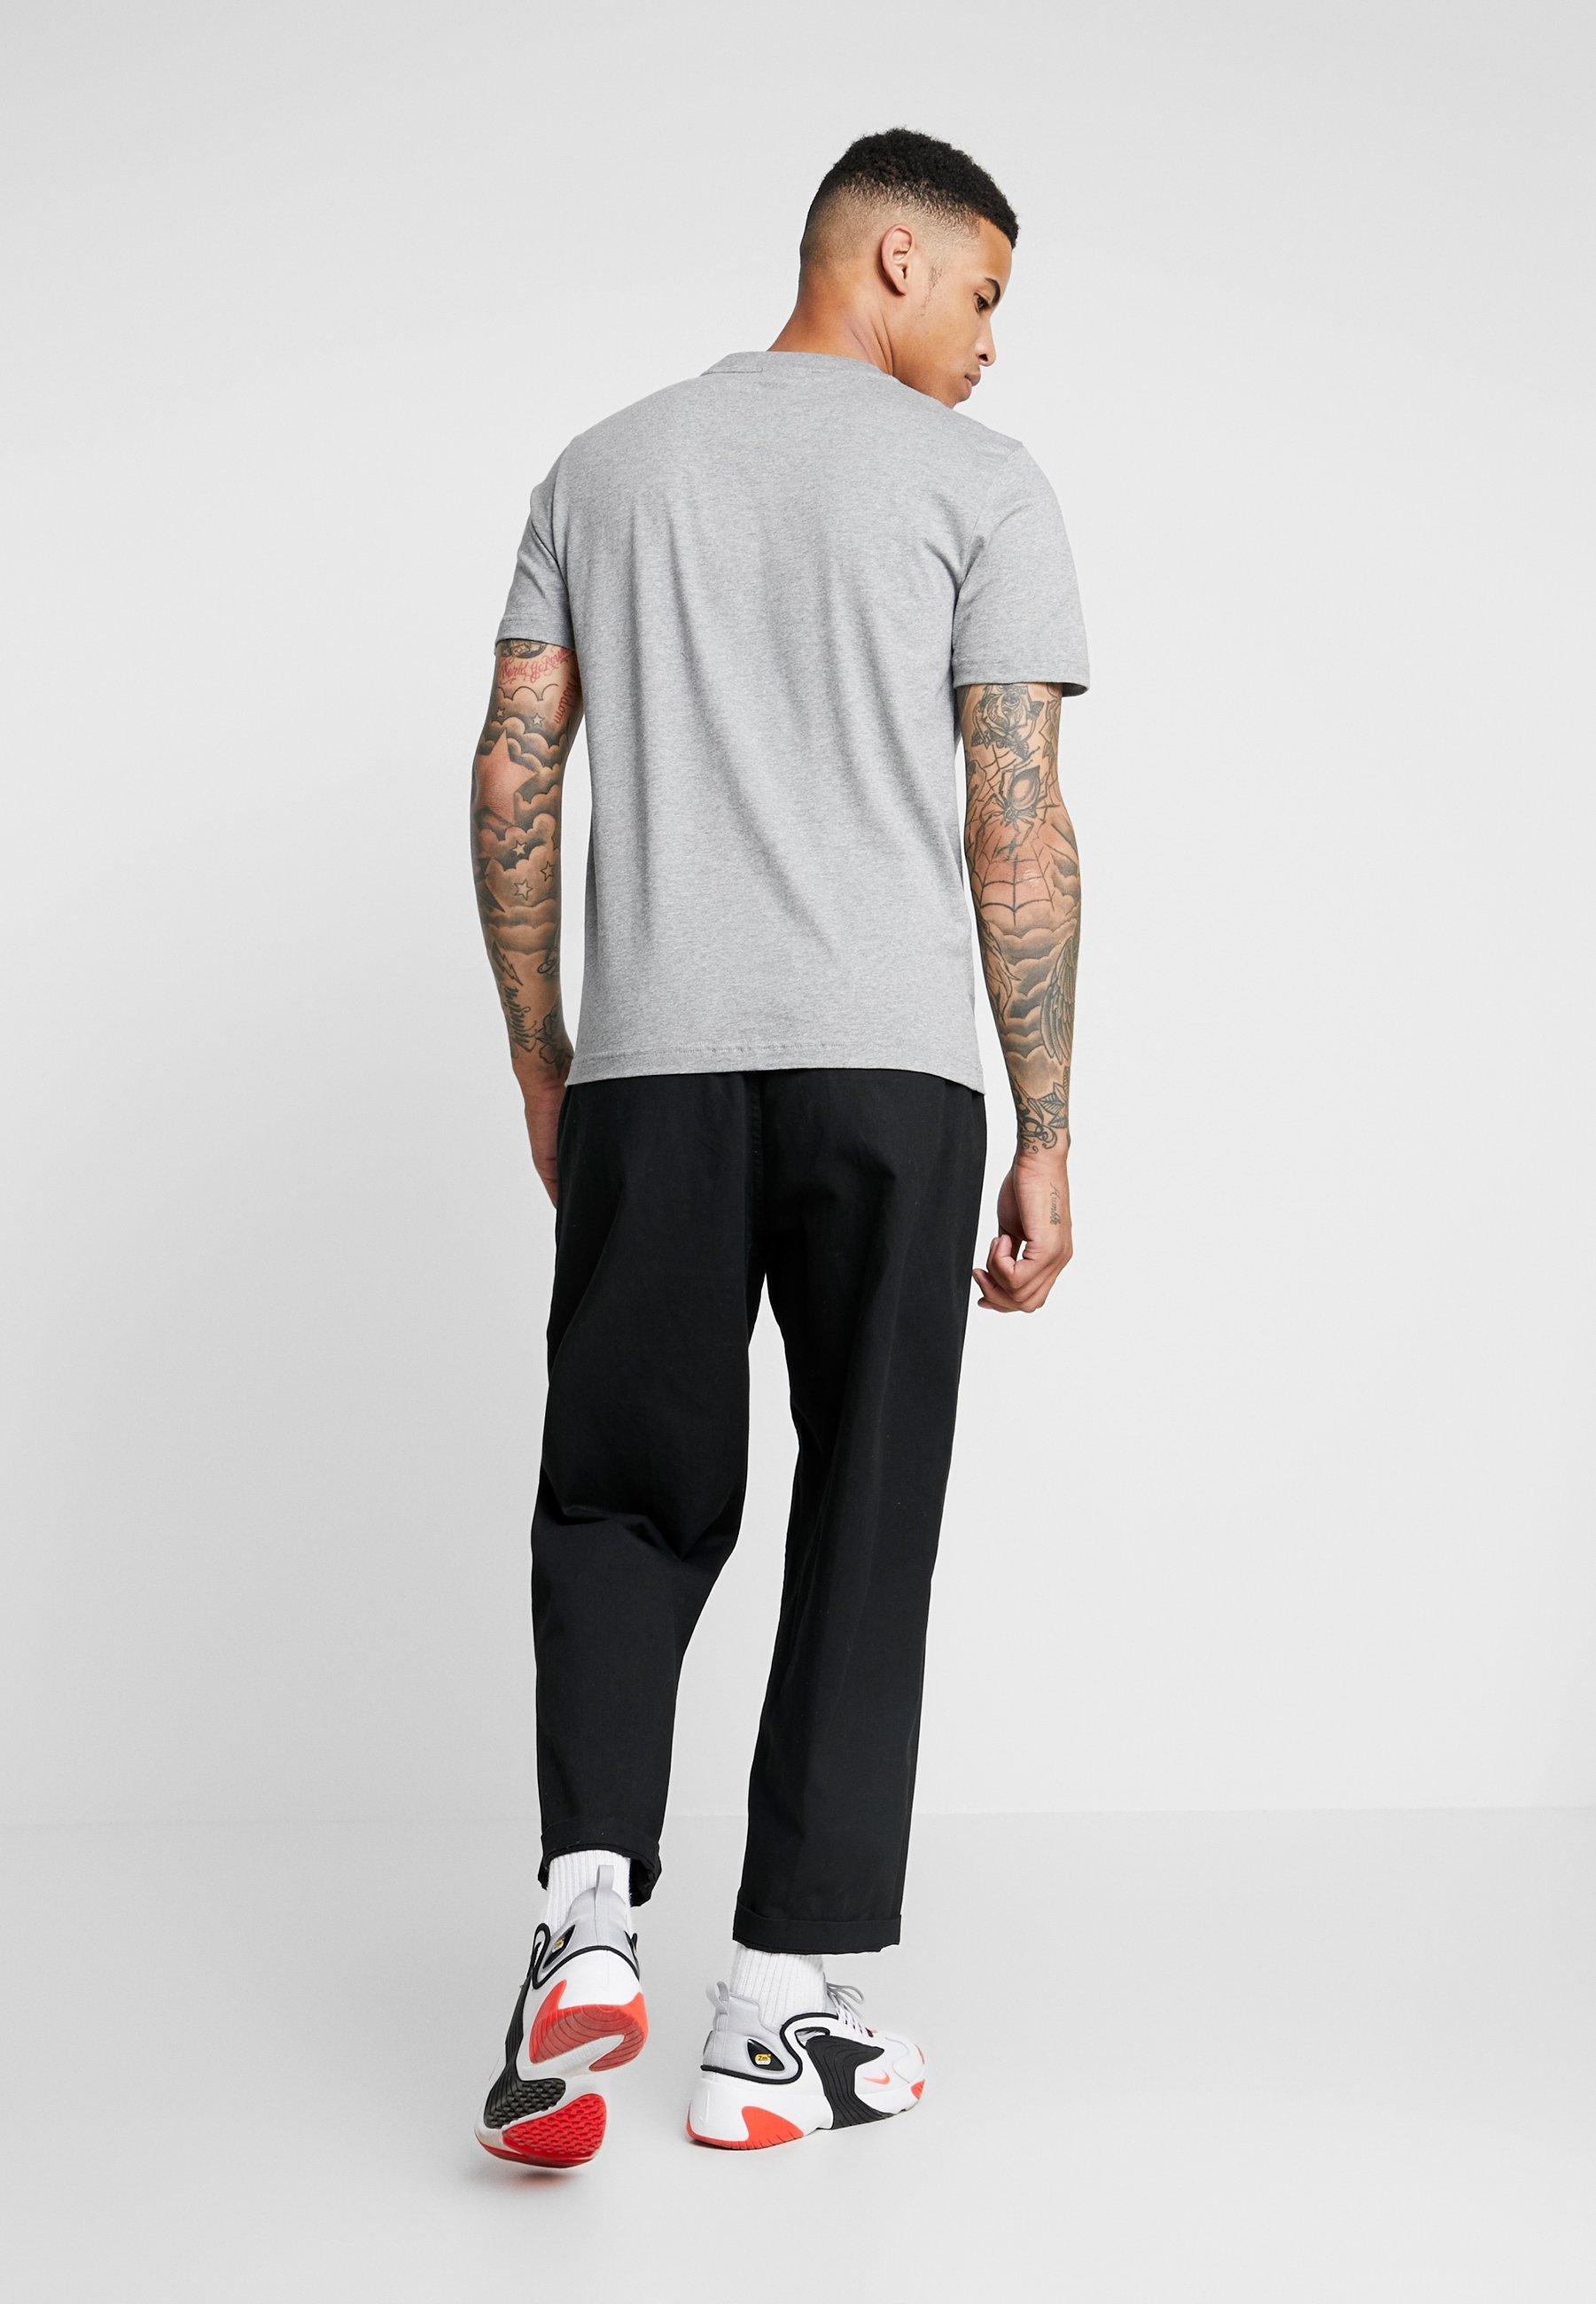 Calvin Klein shirt T Grey ImpriméMid Heather xodBeCr